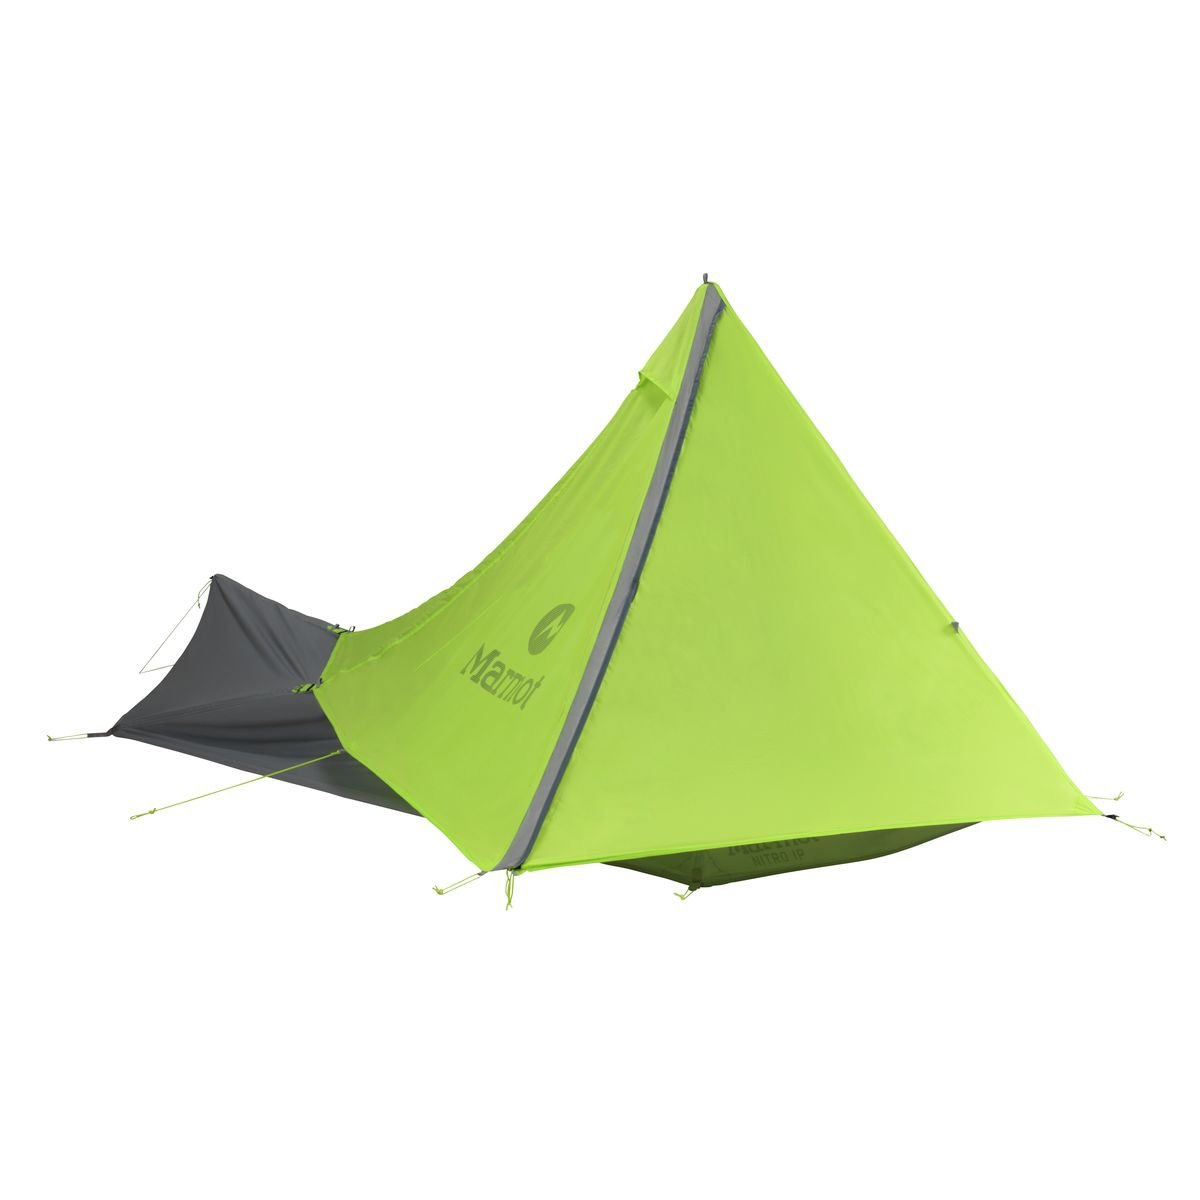 Marmot Nitro 1p Tent: 1-Person 3-Season Green Lime/Steel, One Size by Marmot   B00M85X0OS